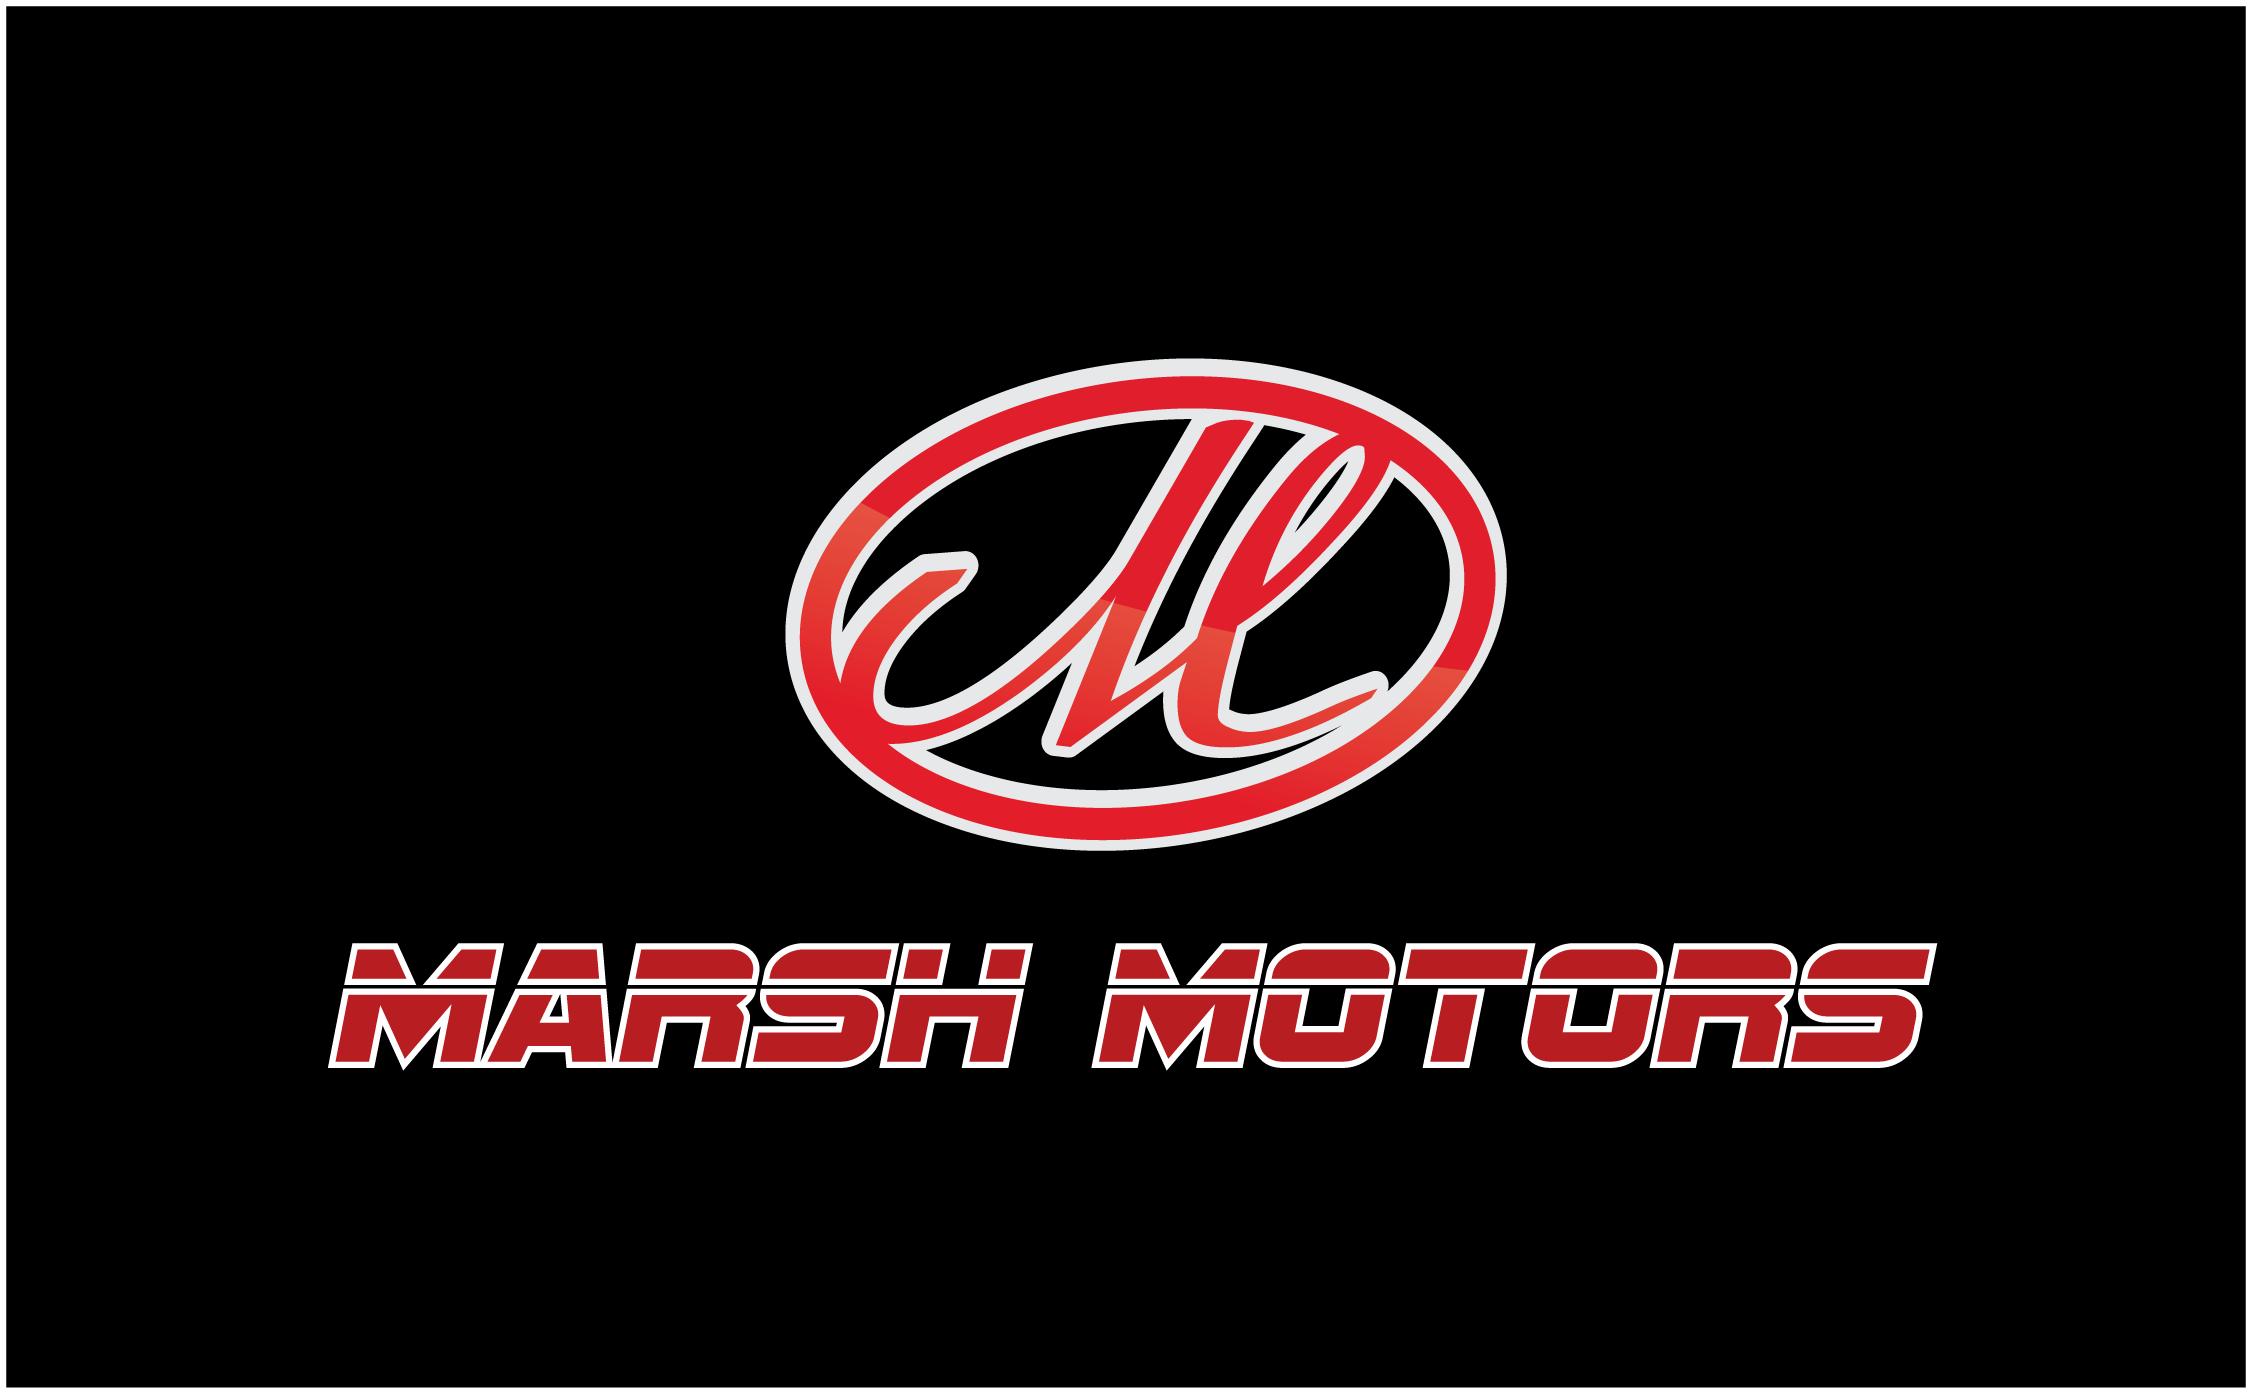 Logo Design by 354studio - Entry No. 59 in the Logo Design Contest Marsh Motors Chrysler Logo Design.